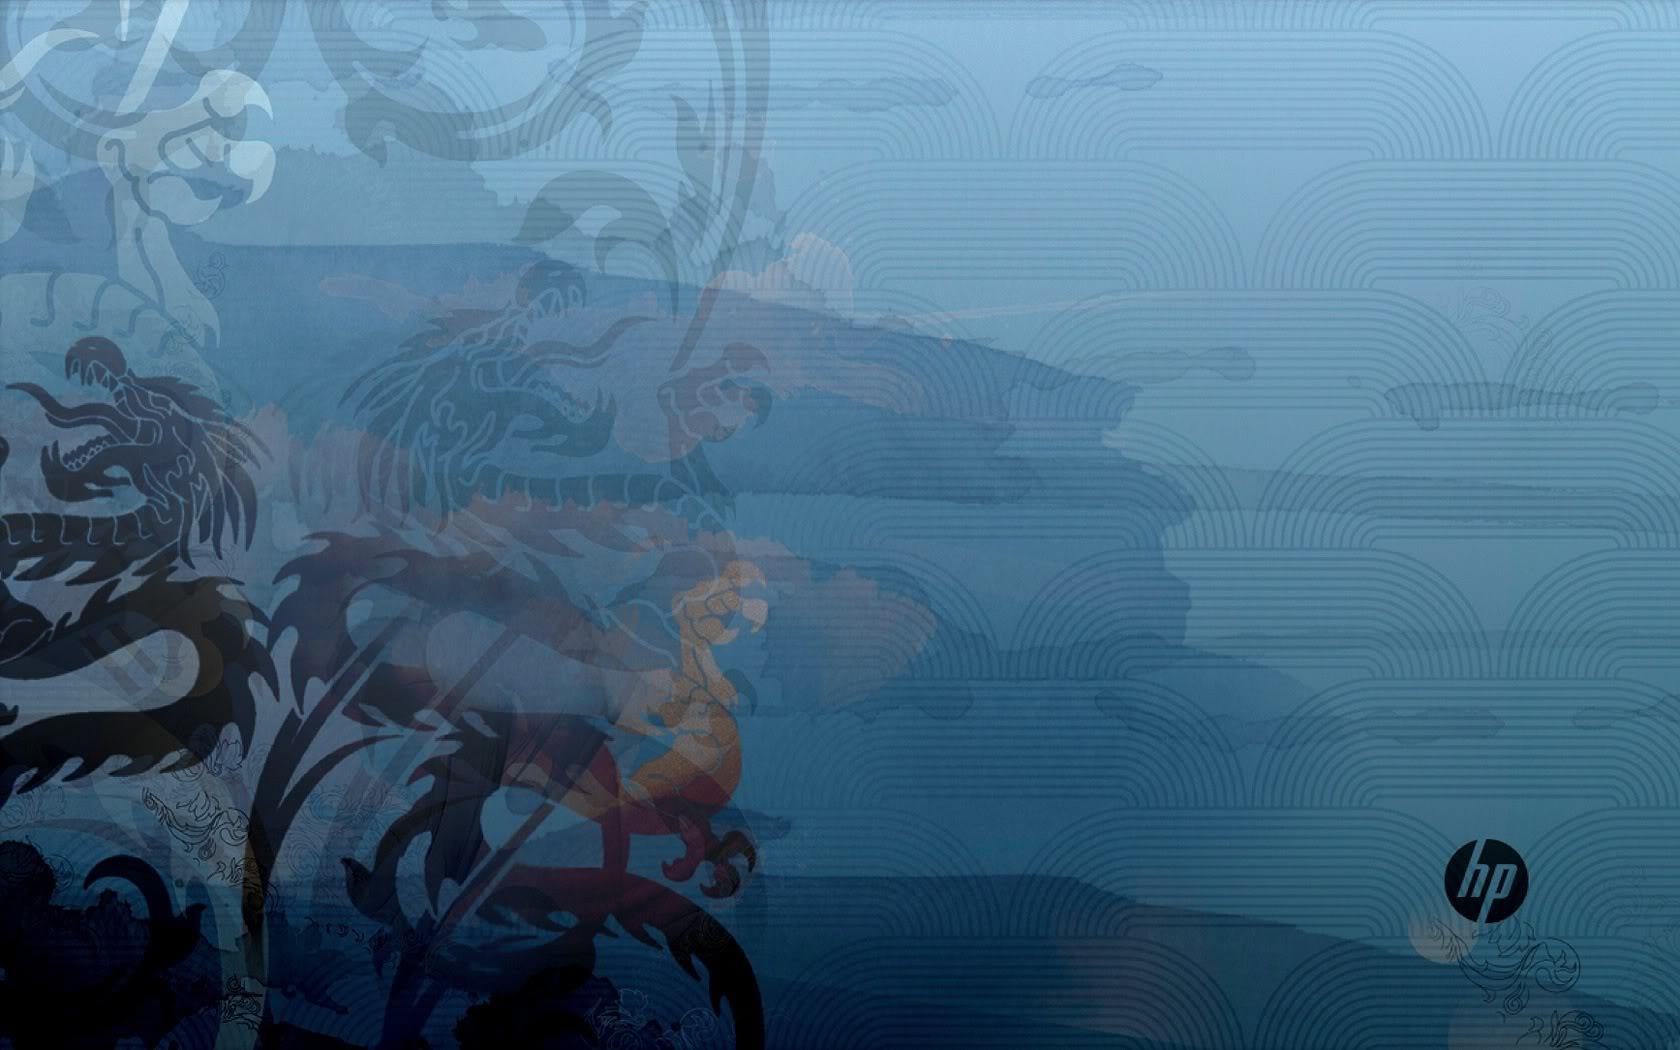 hp download wallpapers Desktop Backgrounds for HD 1680x1050